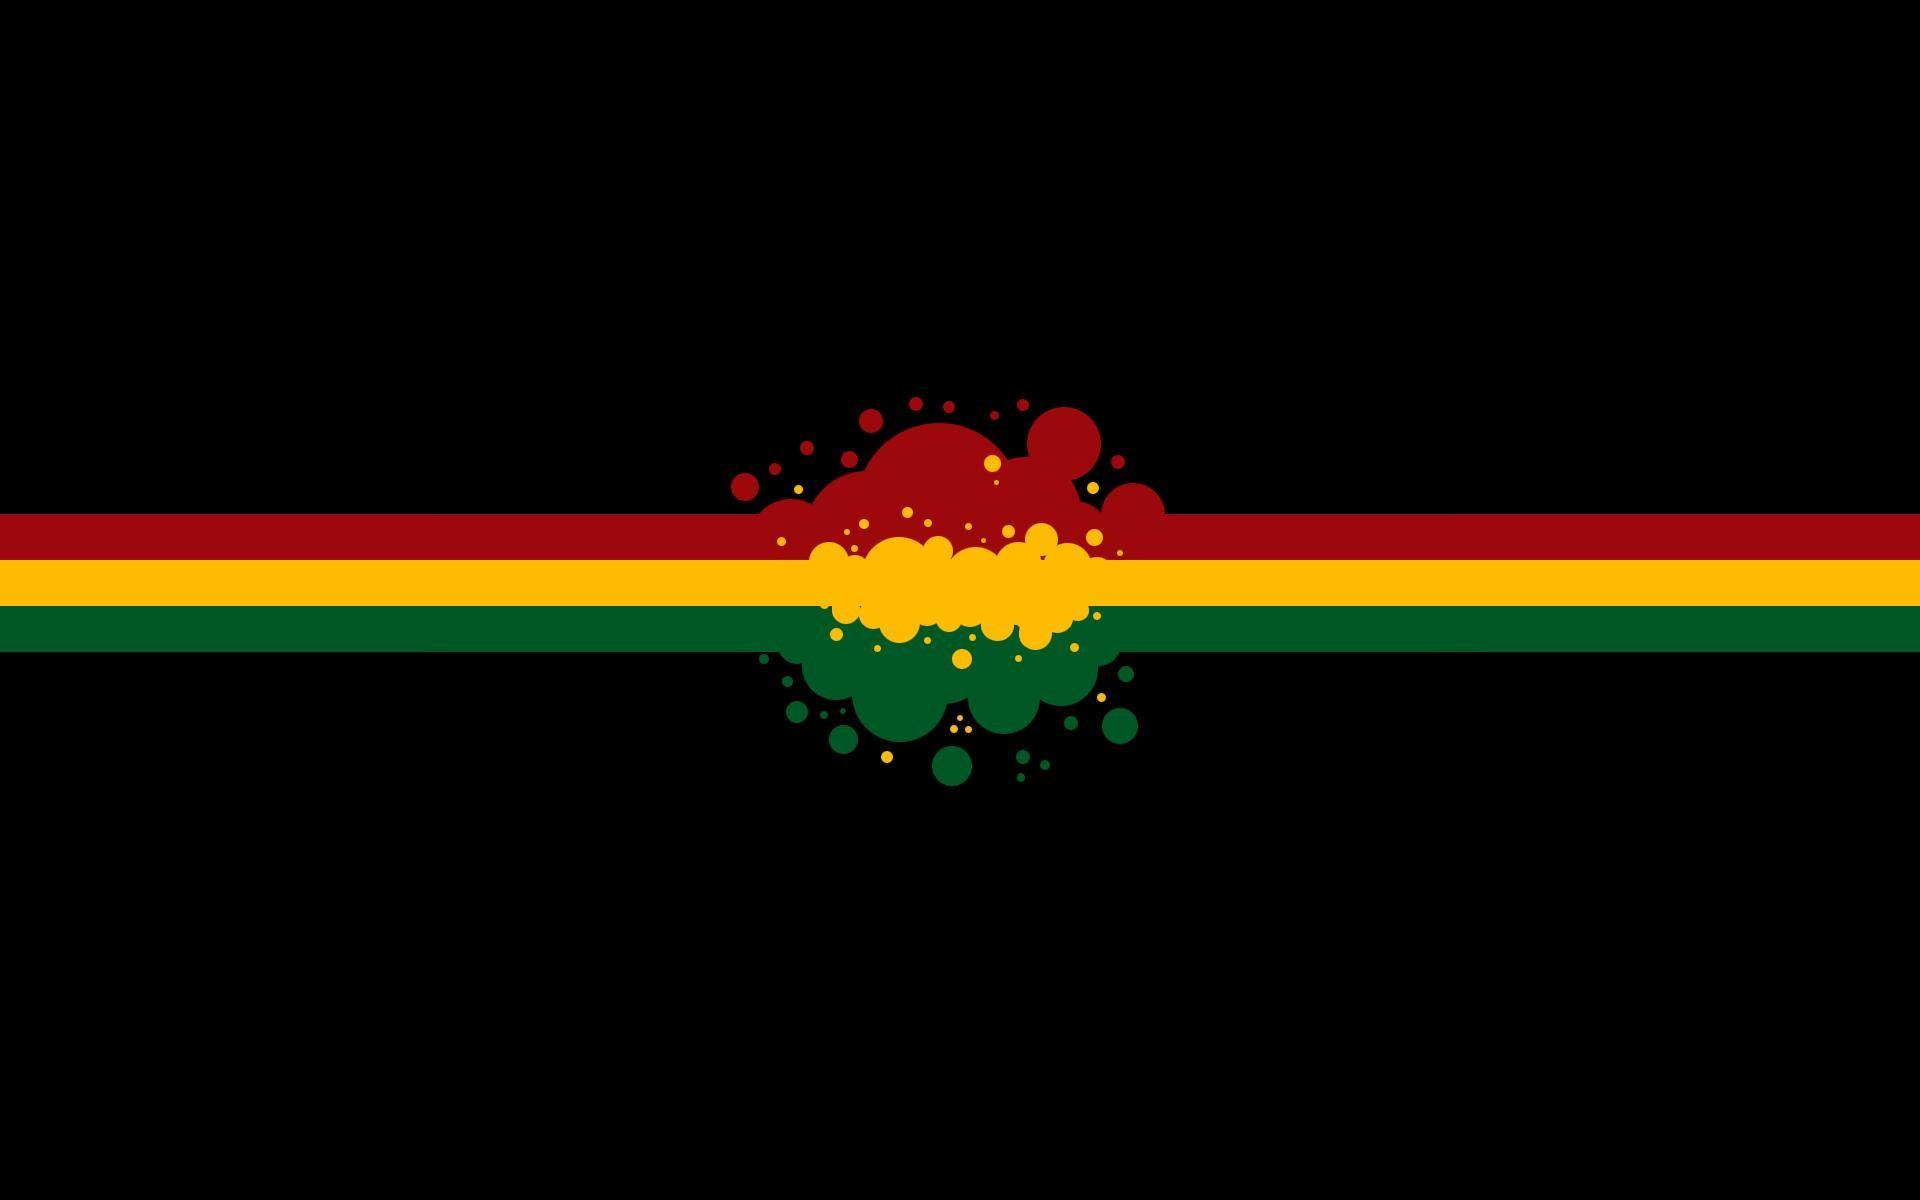 Reggae Wallpaper 61 Images